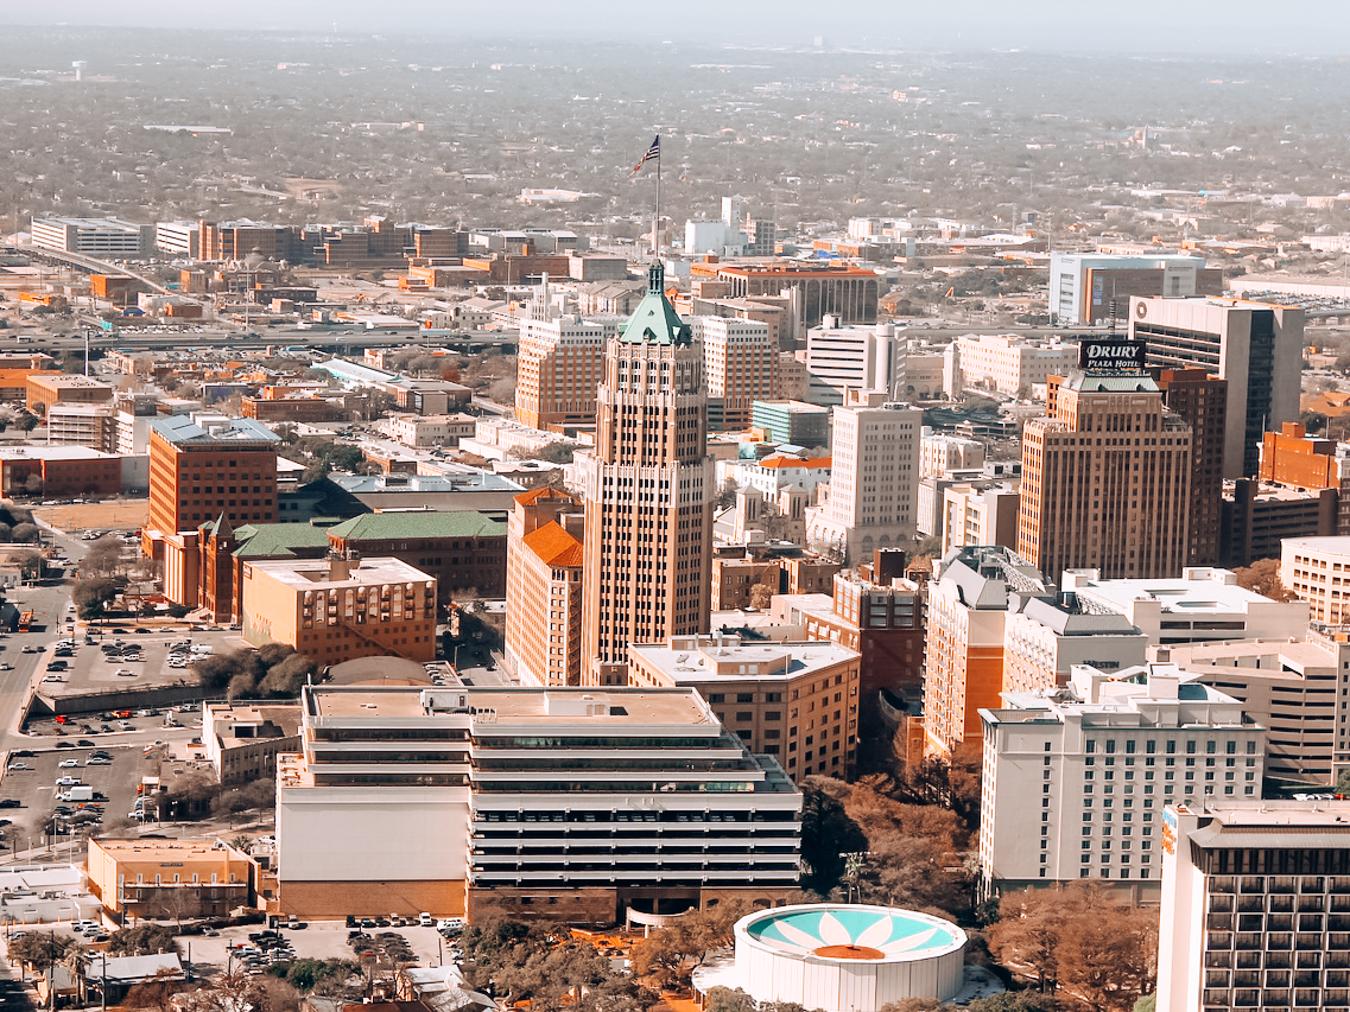 San Antonio from Above